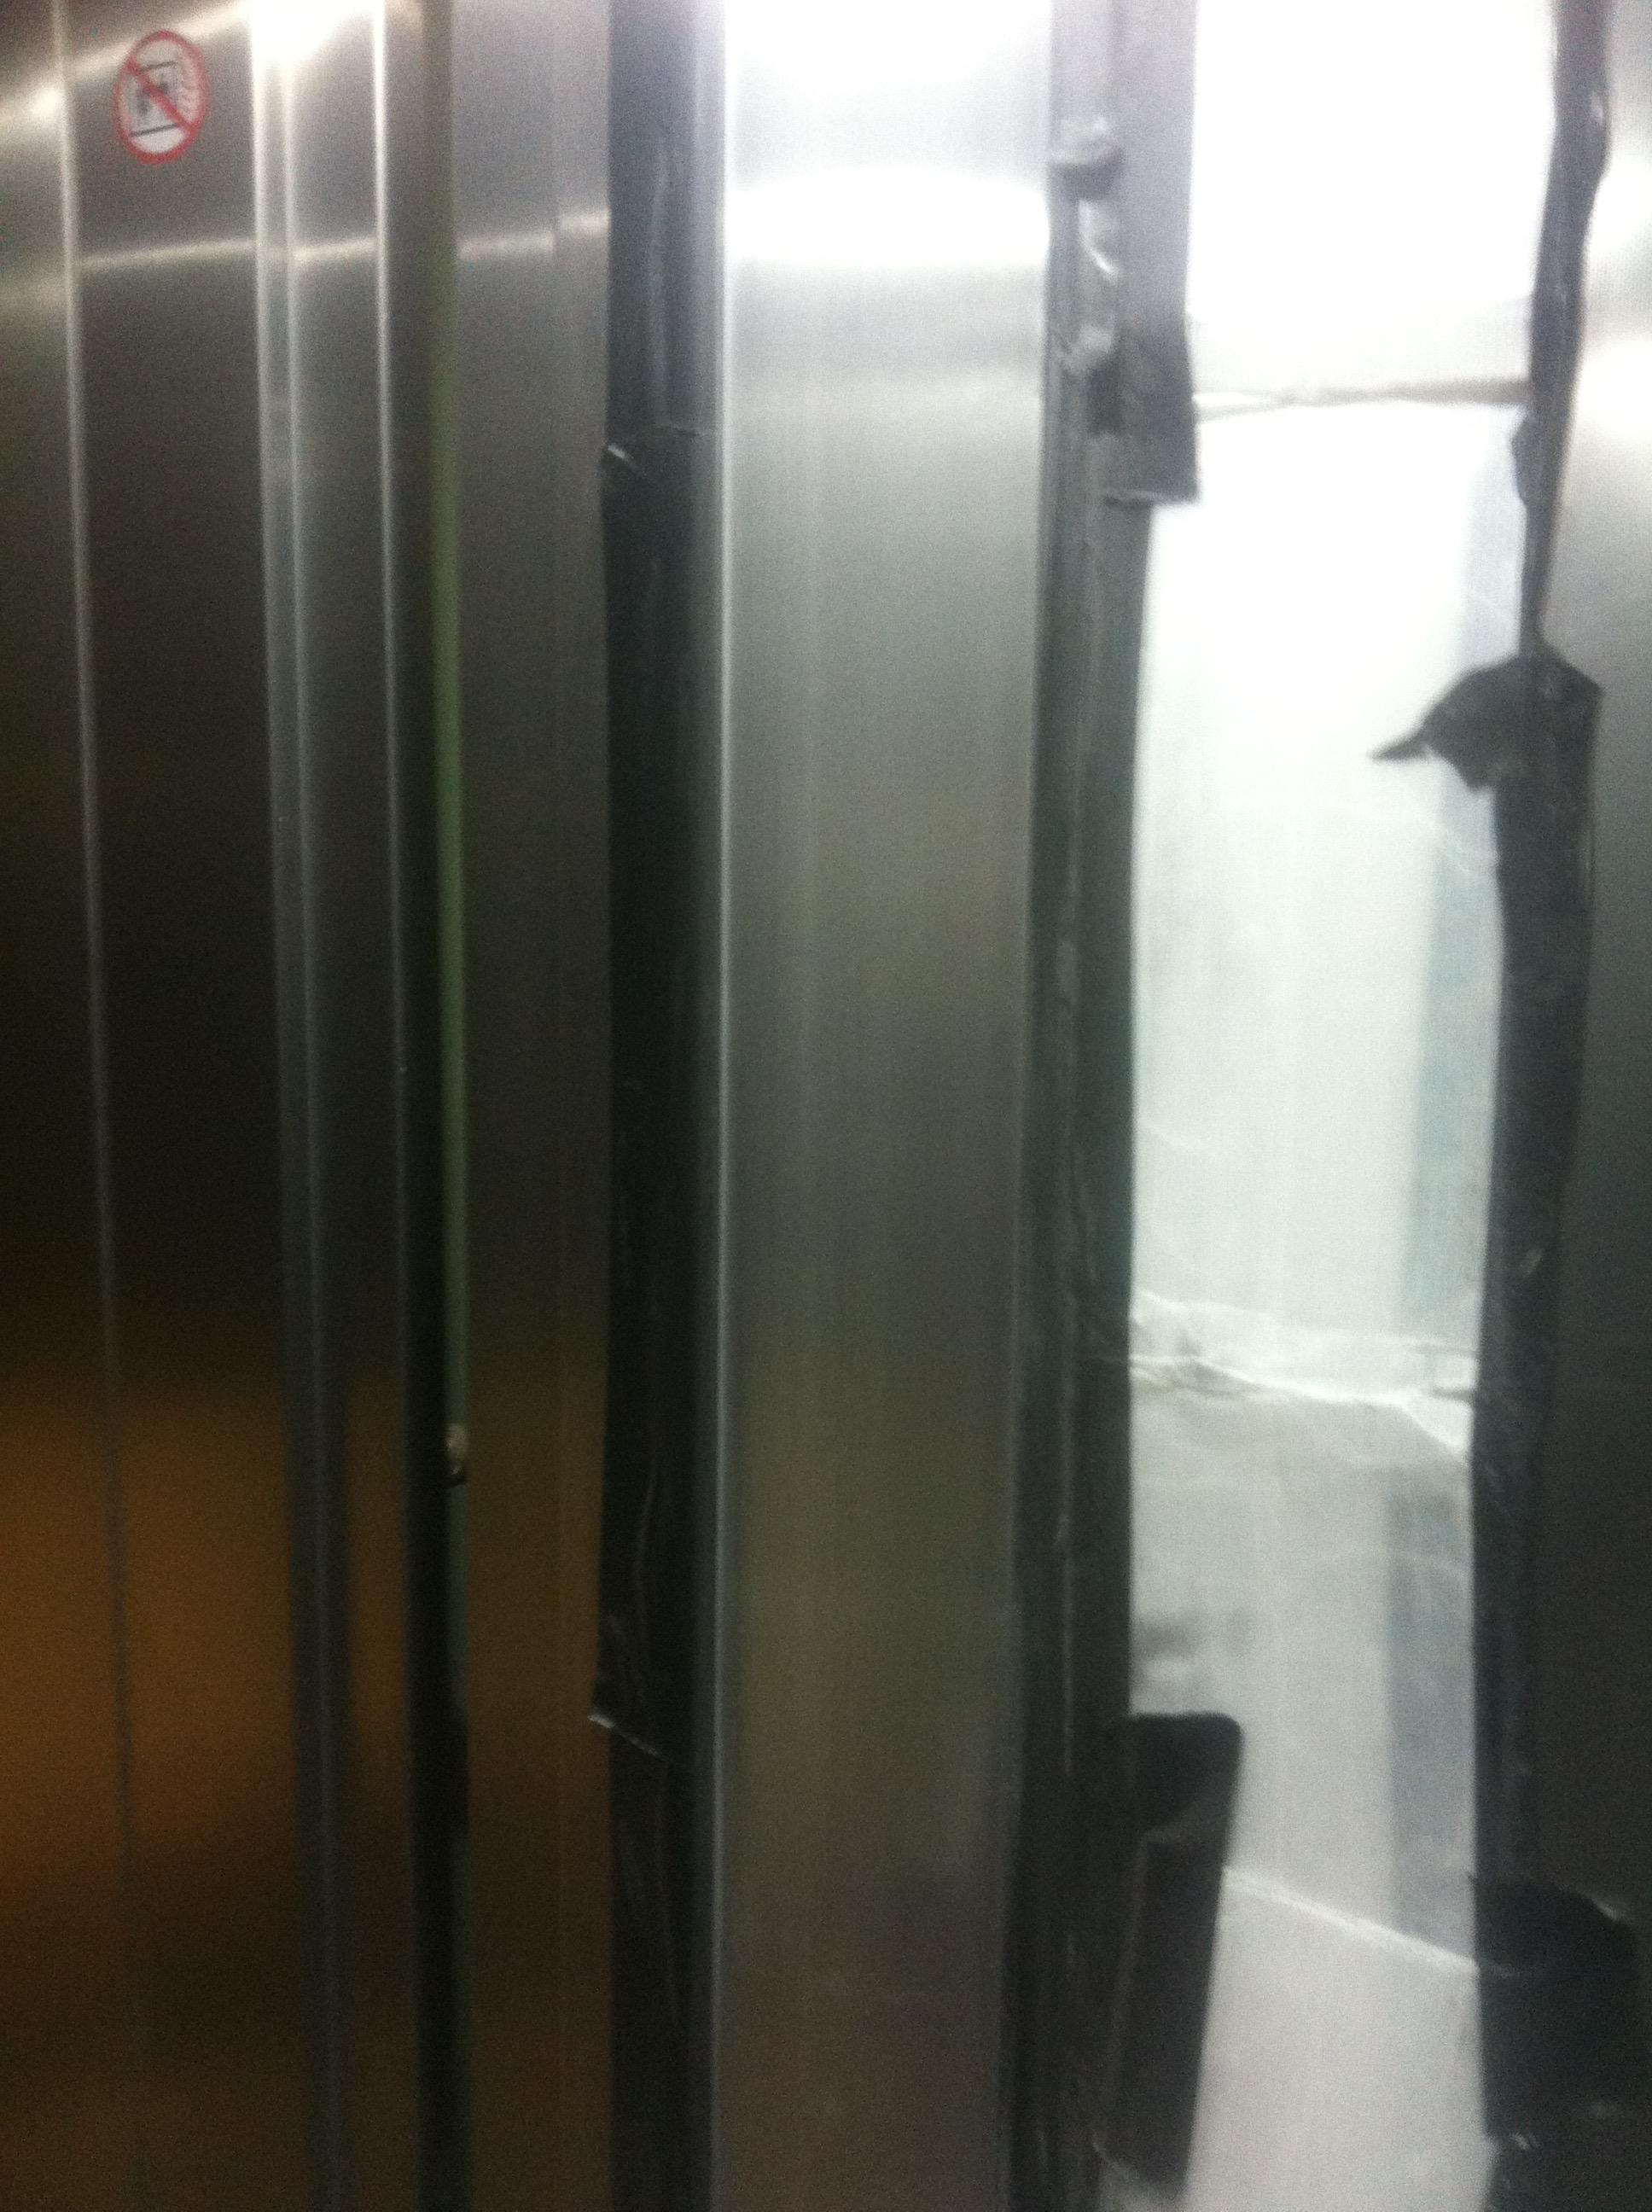 Damaged lift- After